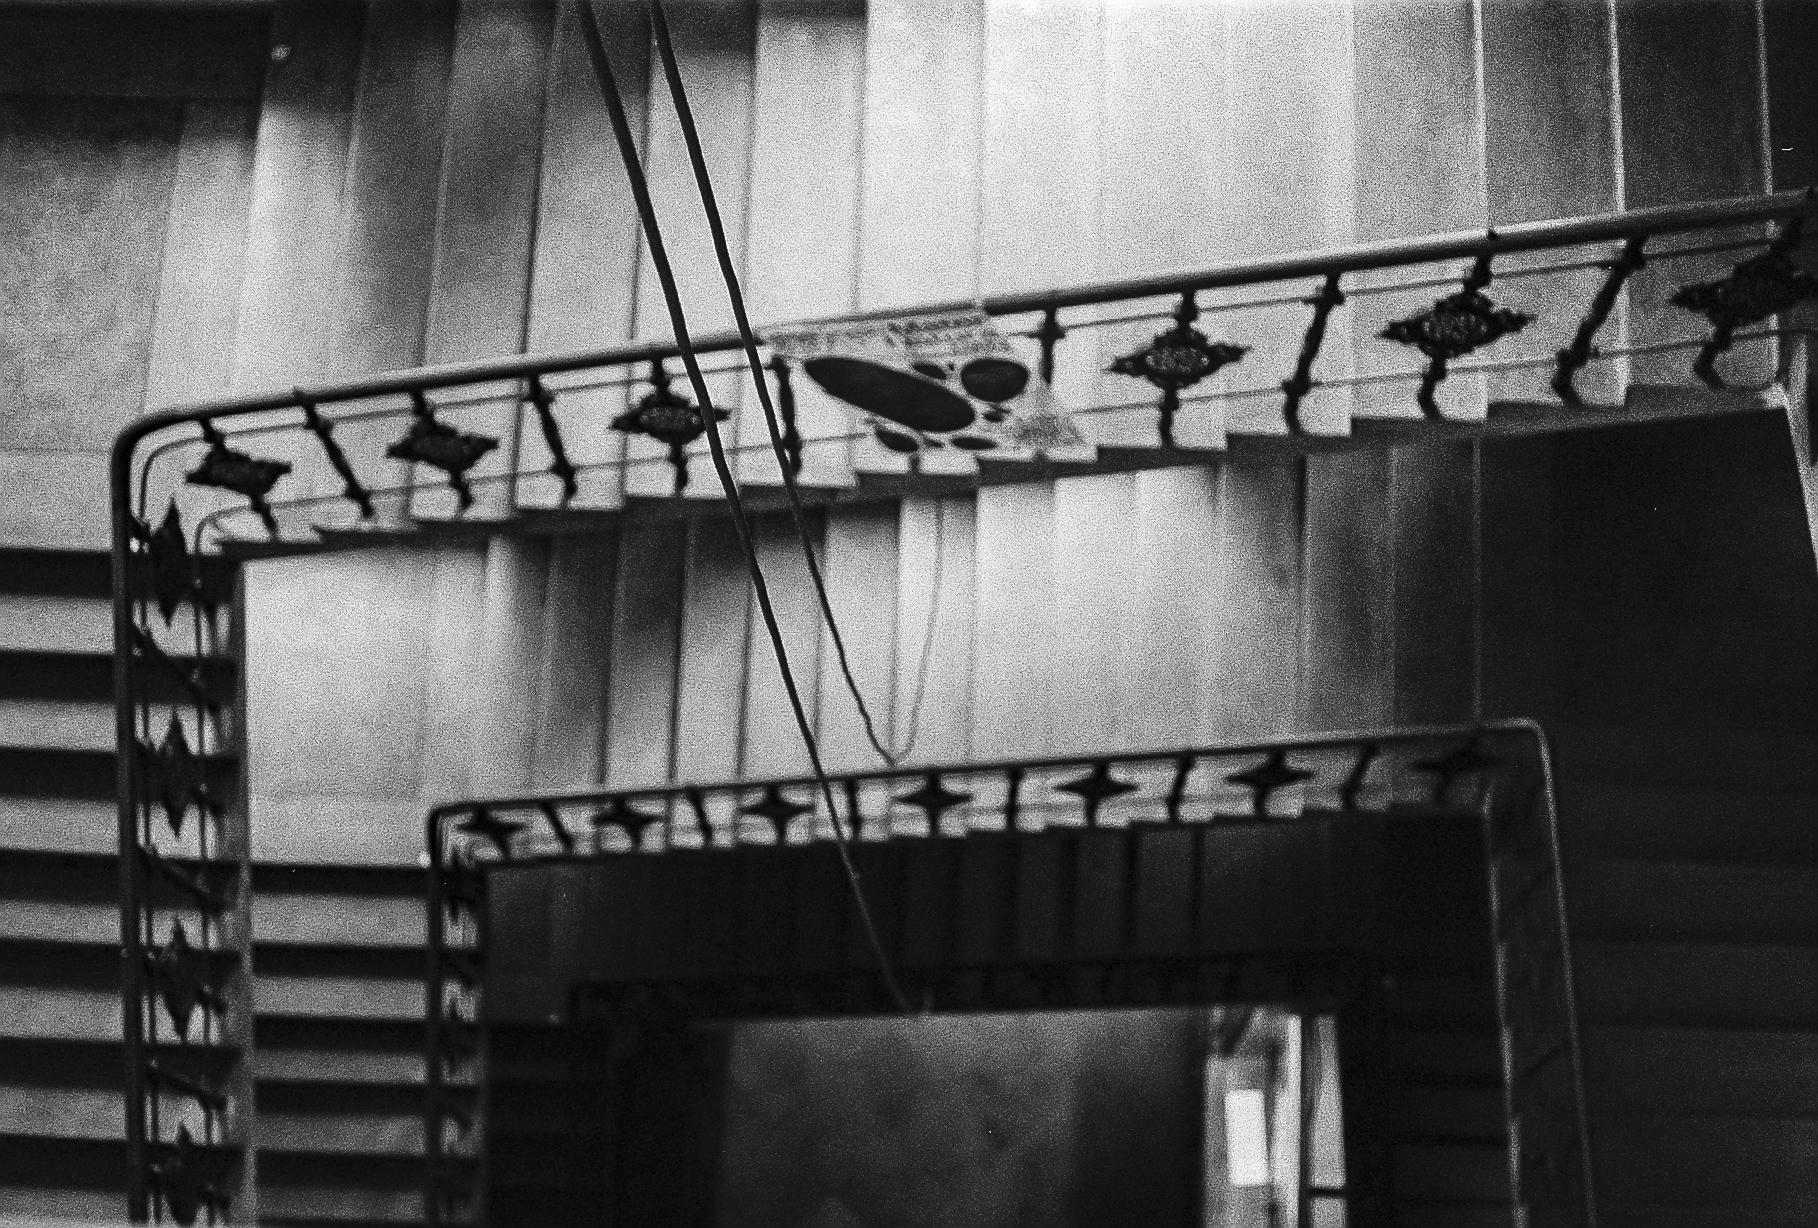 Stairwell in FAMU.